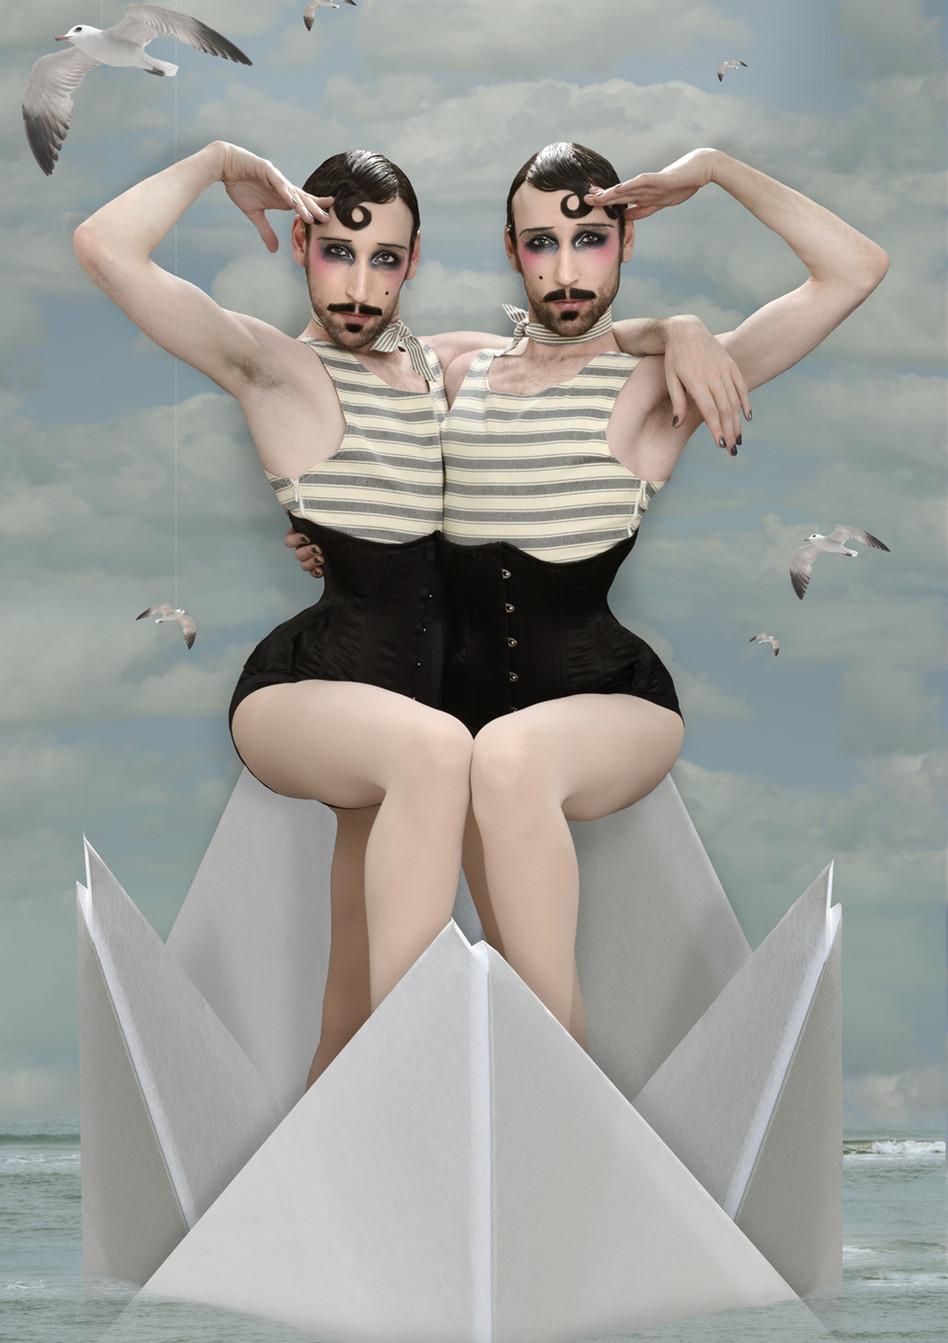 The sailor 9128